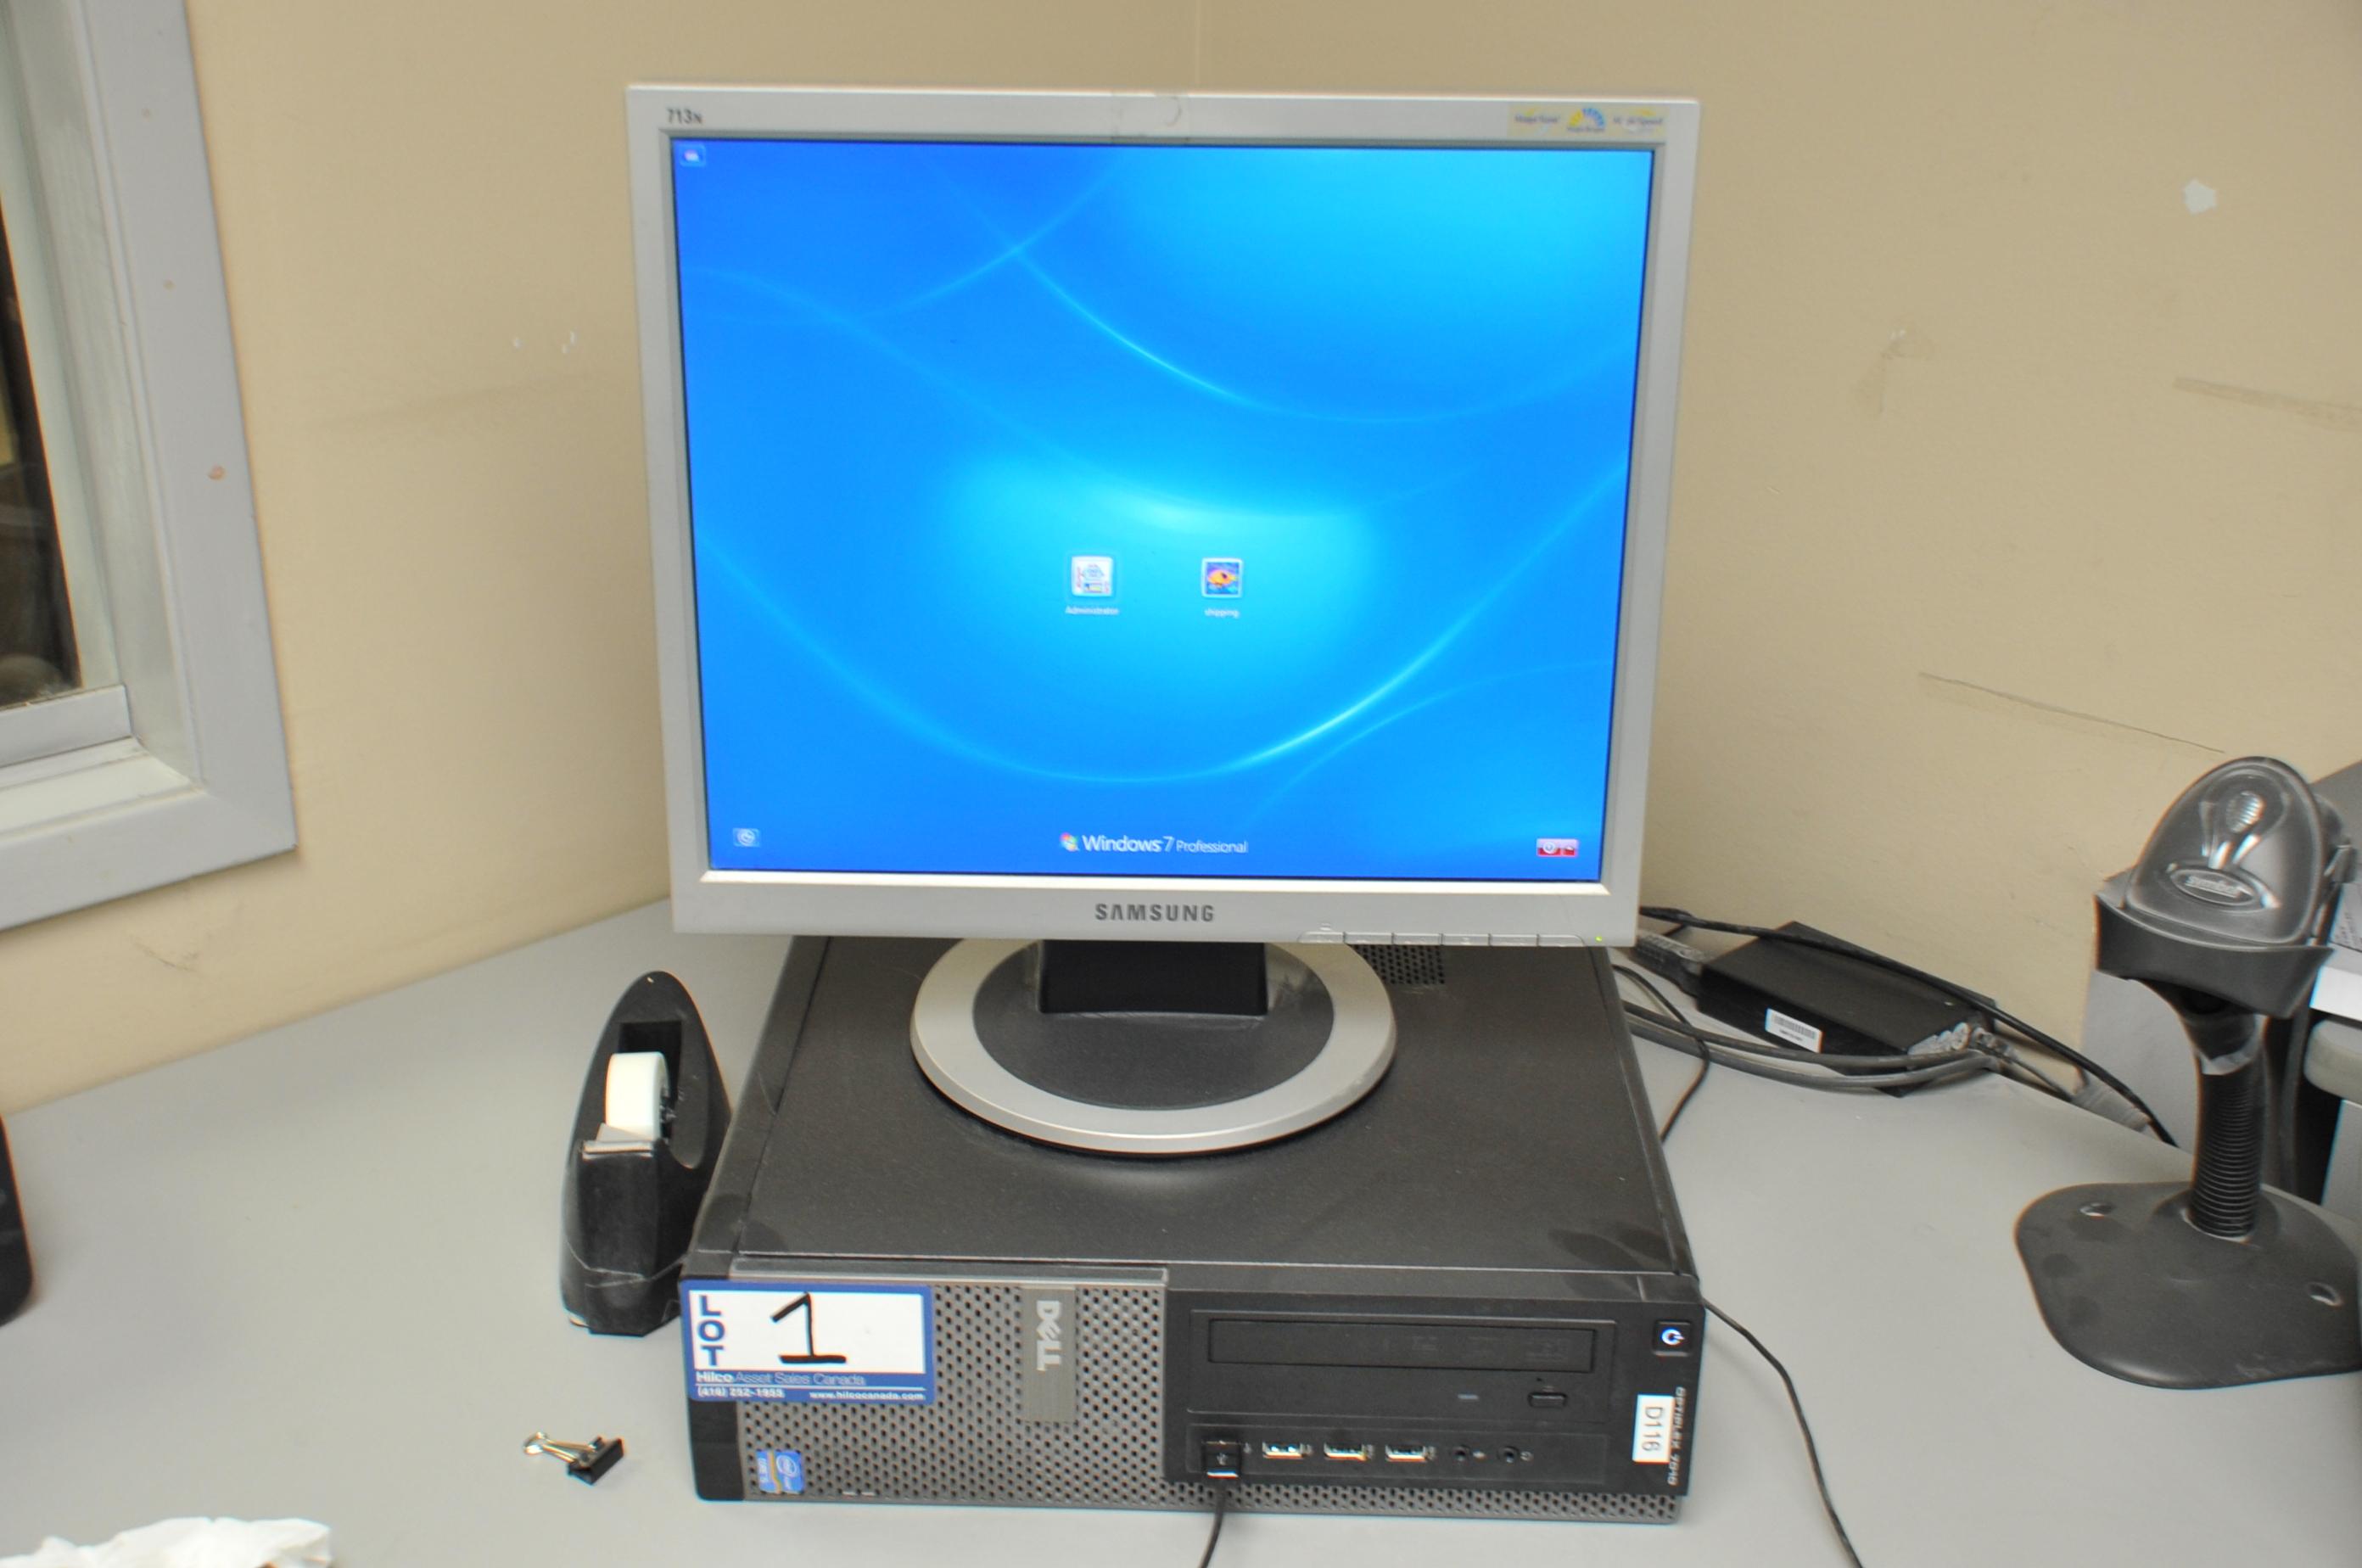 "Dell Model Optiplex 7010 Core I5 Computer; with Samsung 13"" Monitor - Image 2 of 2"